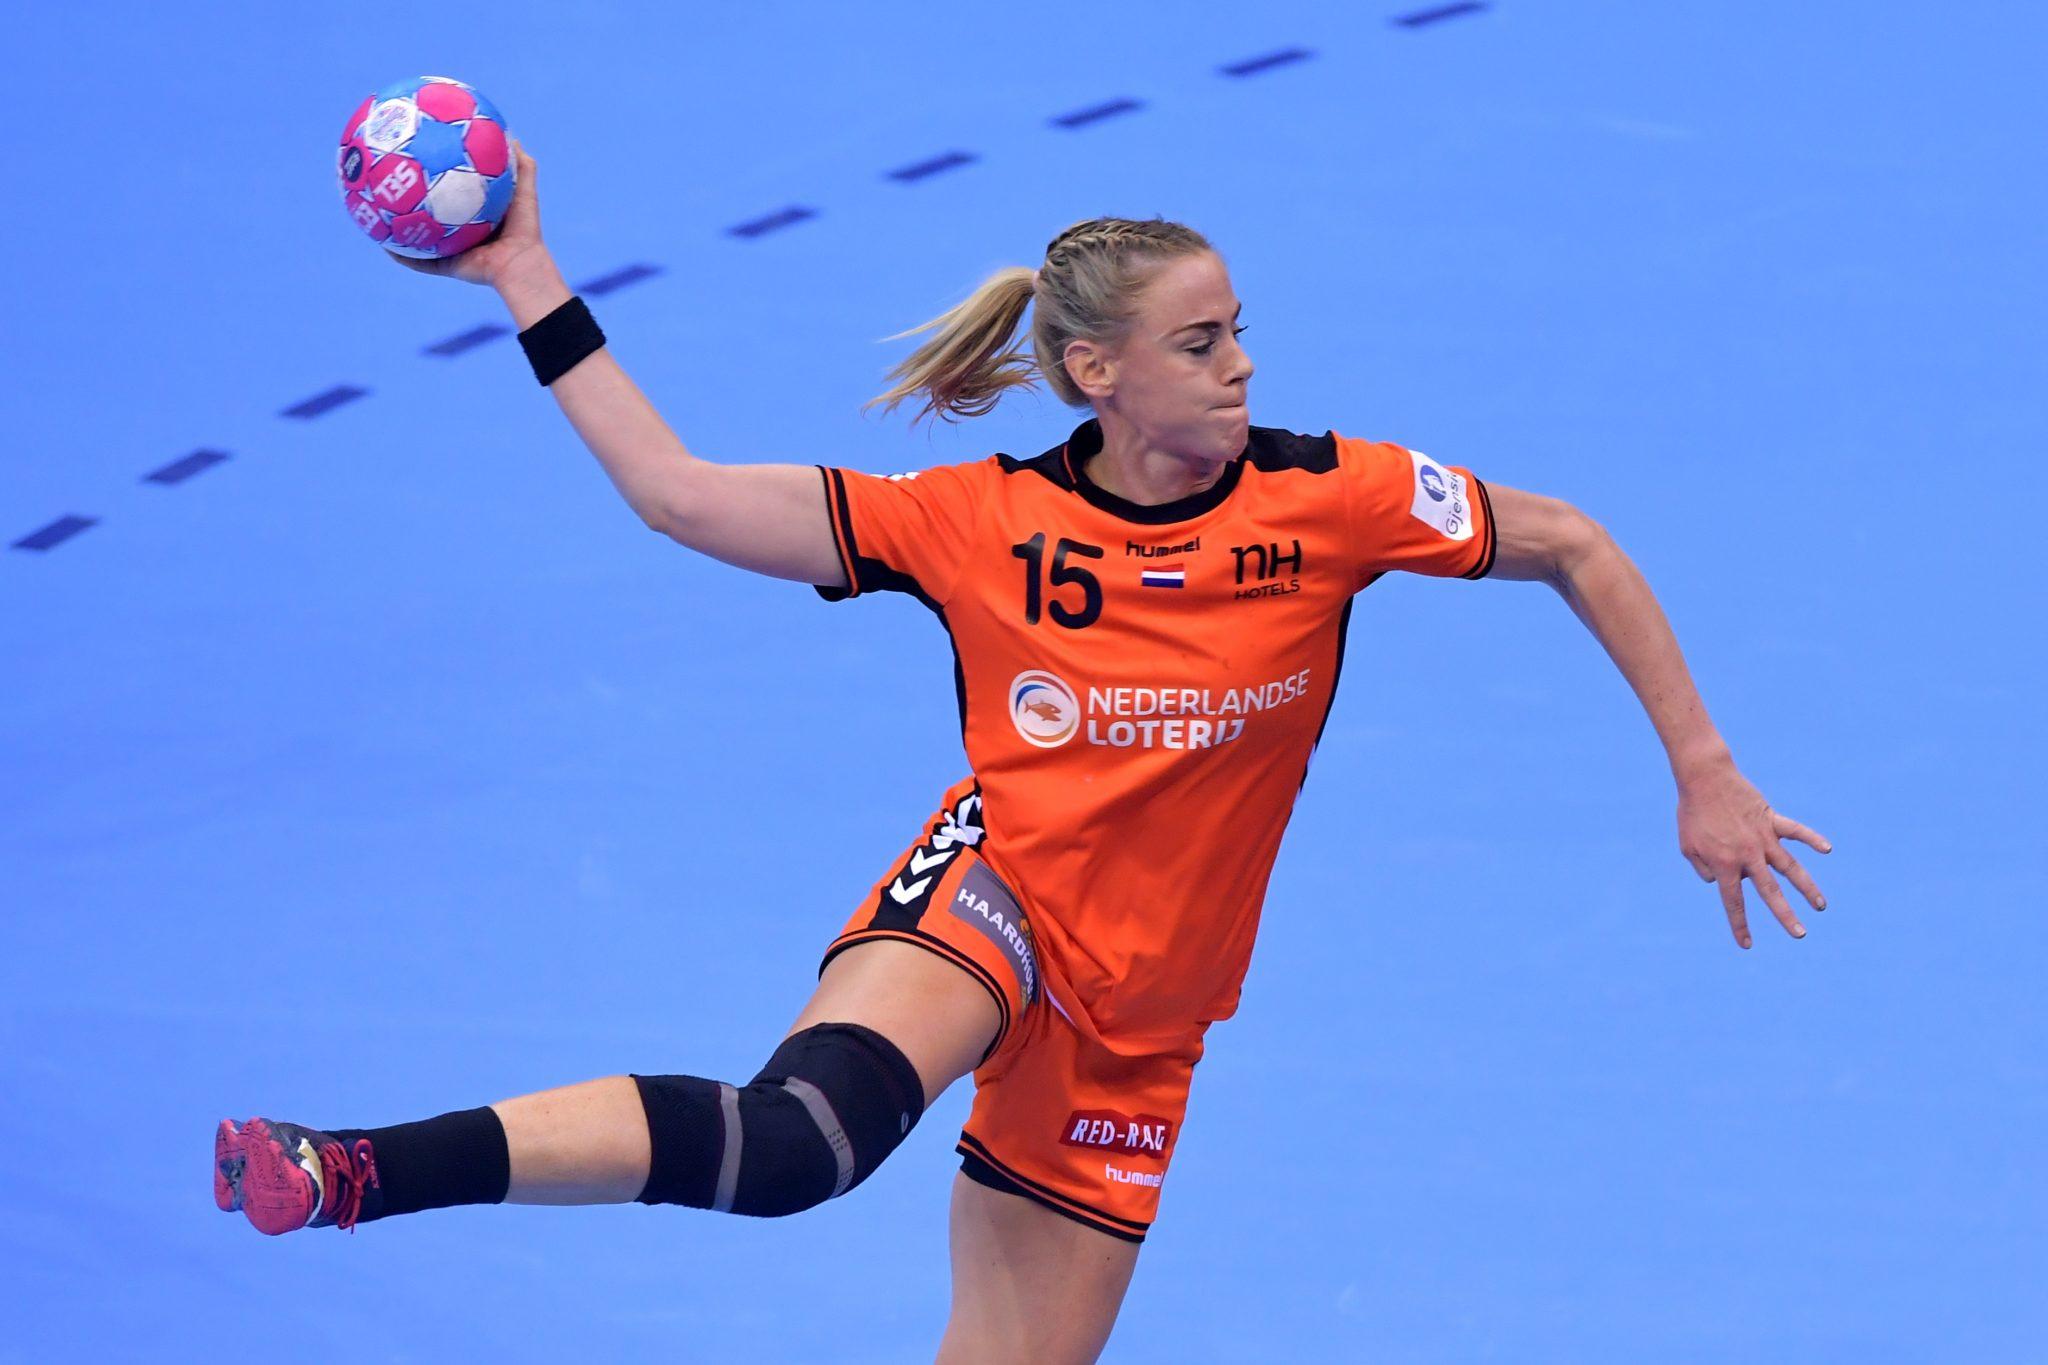 05-12-2018: EK Handbal Vrouwen: Nederland V Kroatie: MontBeliard EK Handbal In Frankrijk, Voorronde Groep C Nederland - Kroatie Maura Visser #15  NED